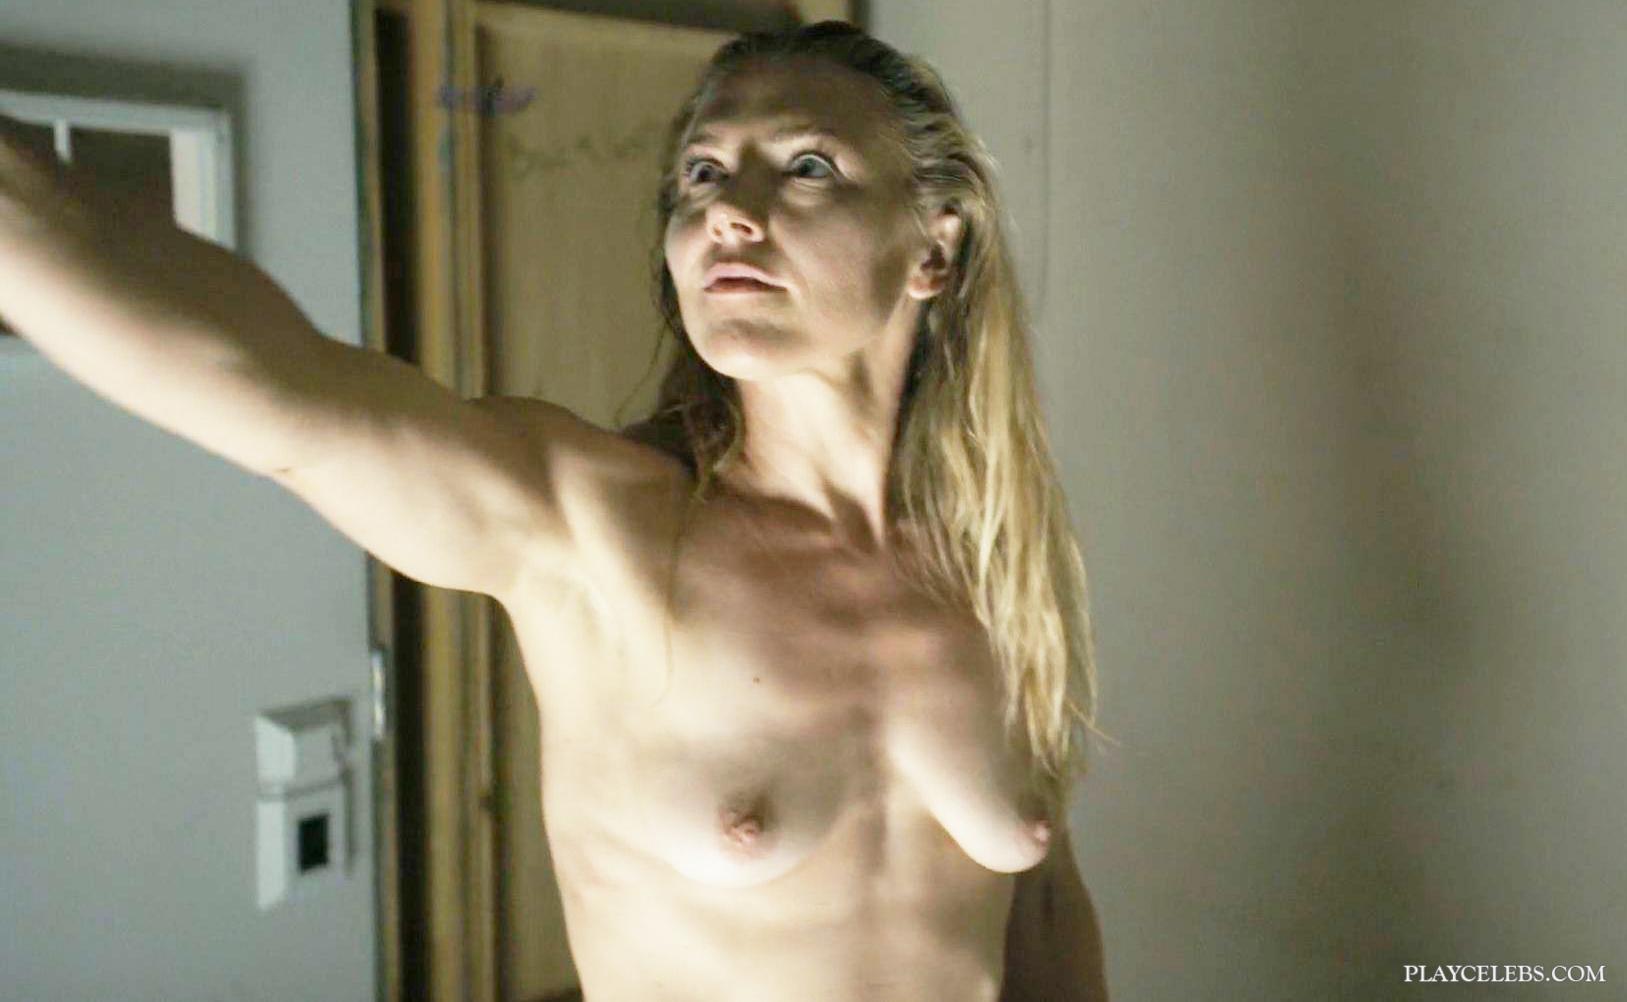 Dominique swain nude